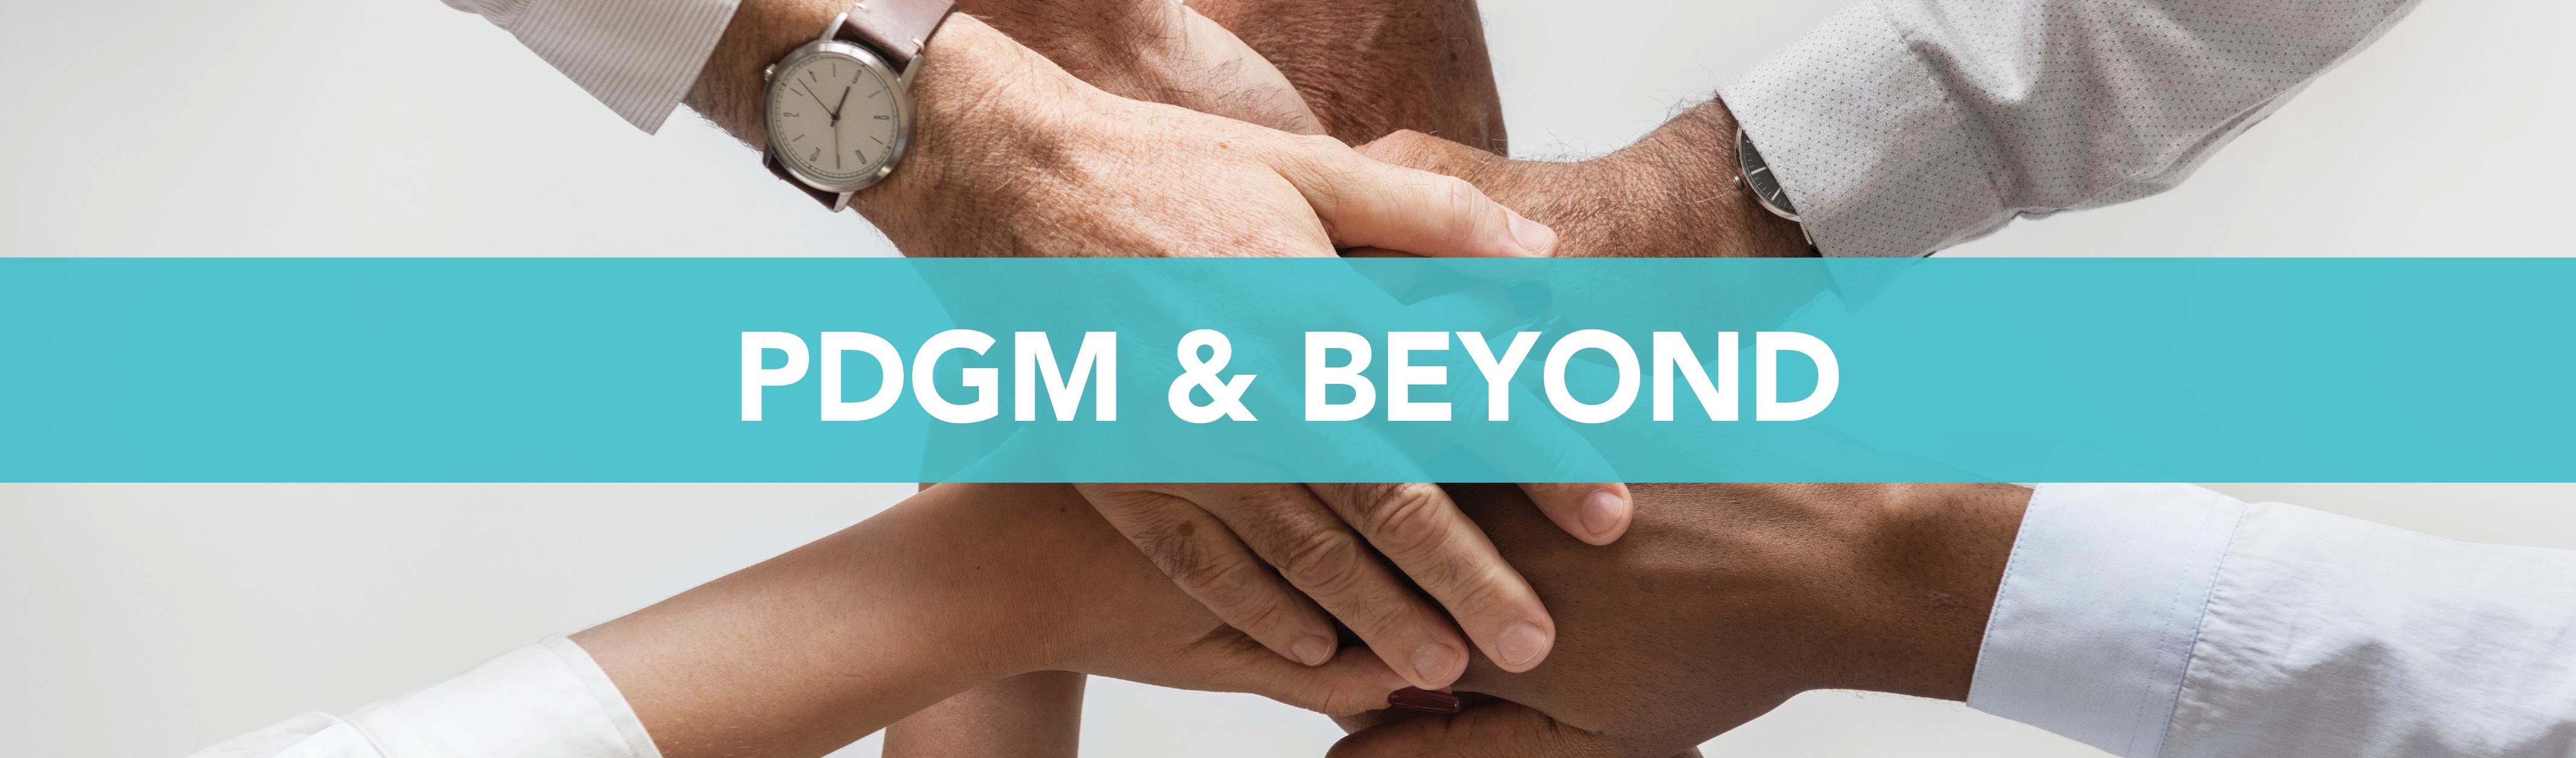 PDGM & Beyond